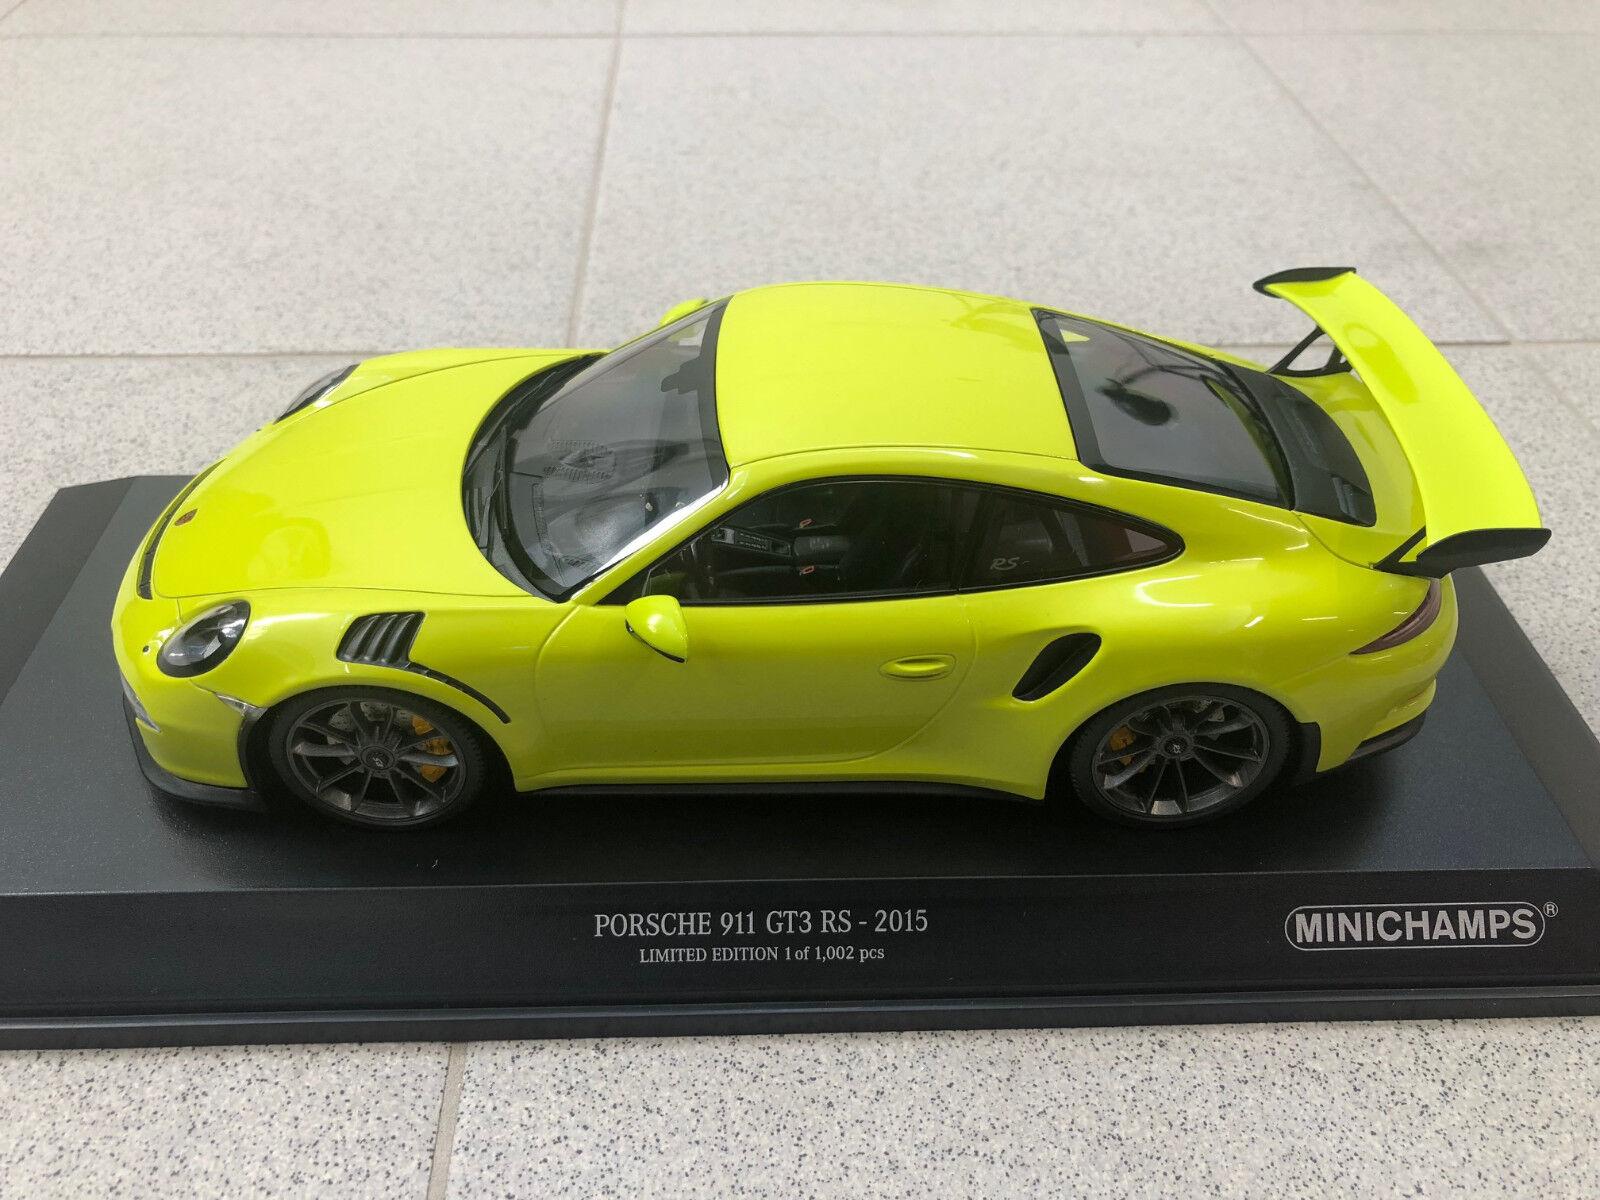 Porsche 911 991 GT3 RS lichtgr 65533; (65533; n gr 65533; (n gr)  65533; n 2015 limitert Minichamps modellllerlerlbil 1 18